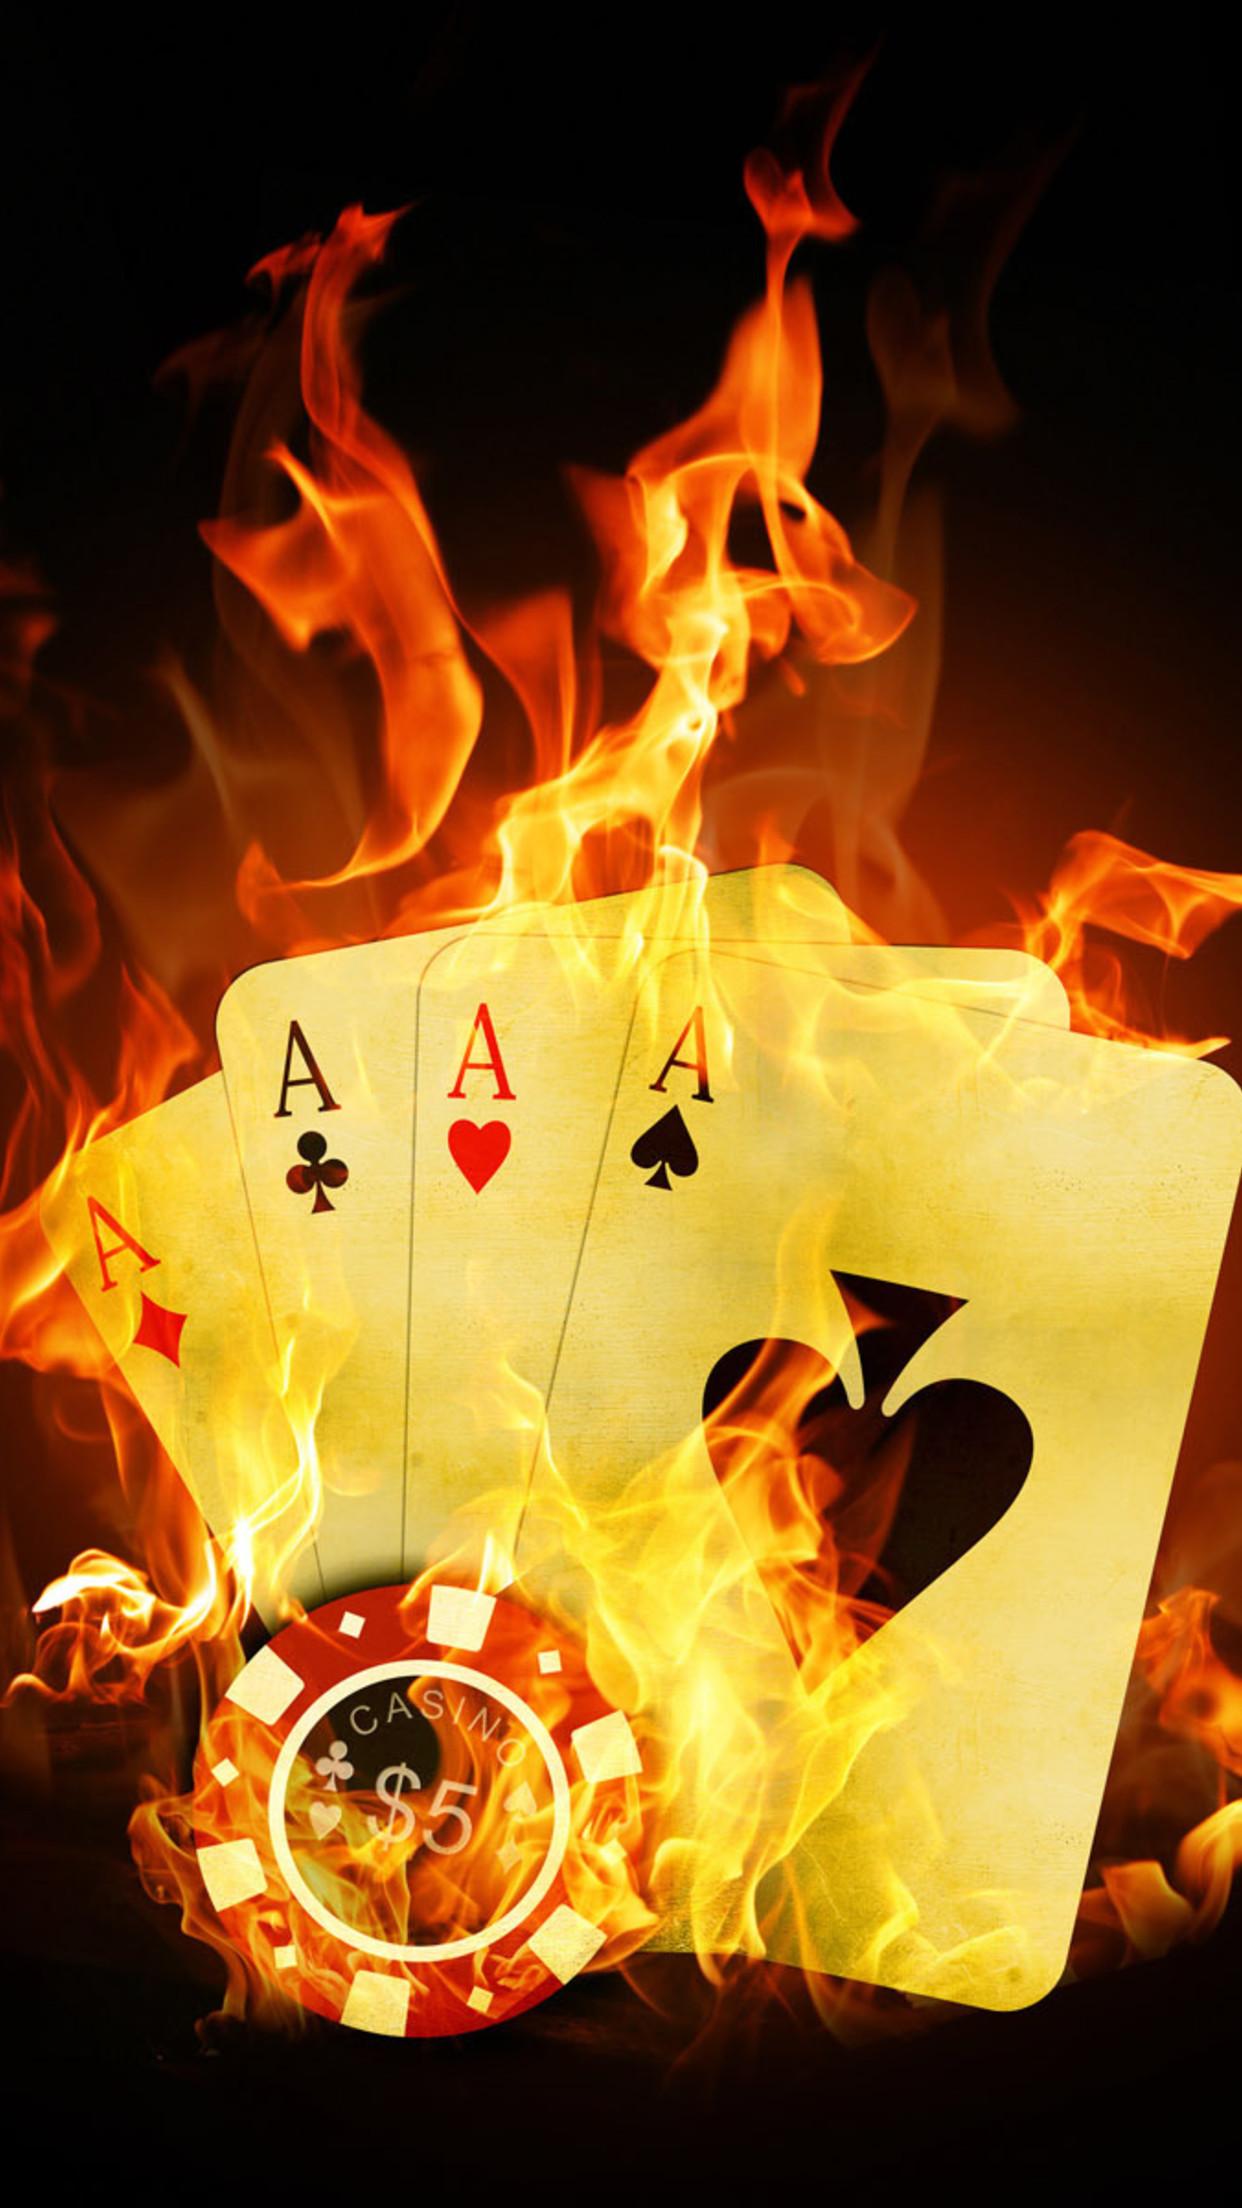 card fire 3Wallpapers iPhone Parallax Card Fire